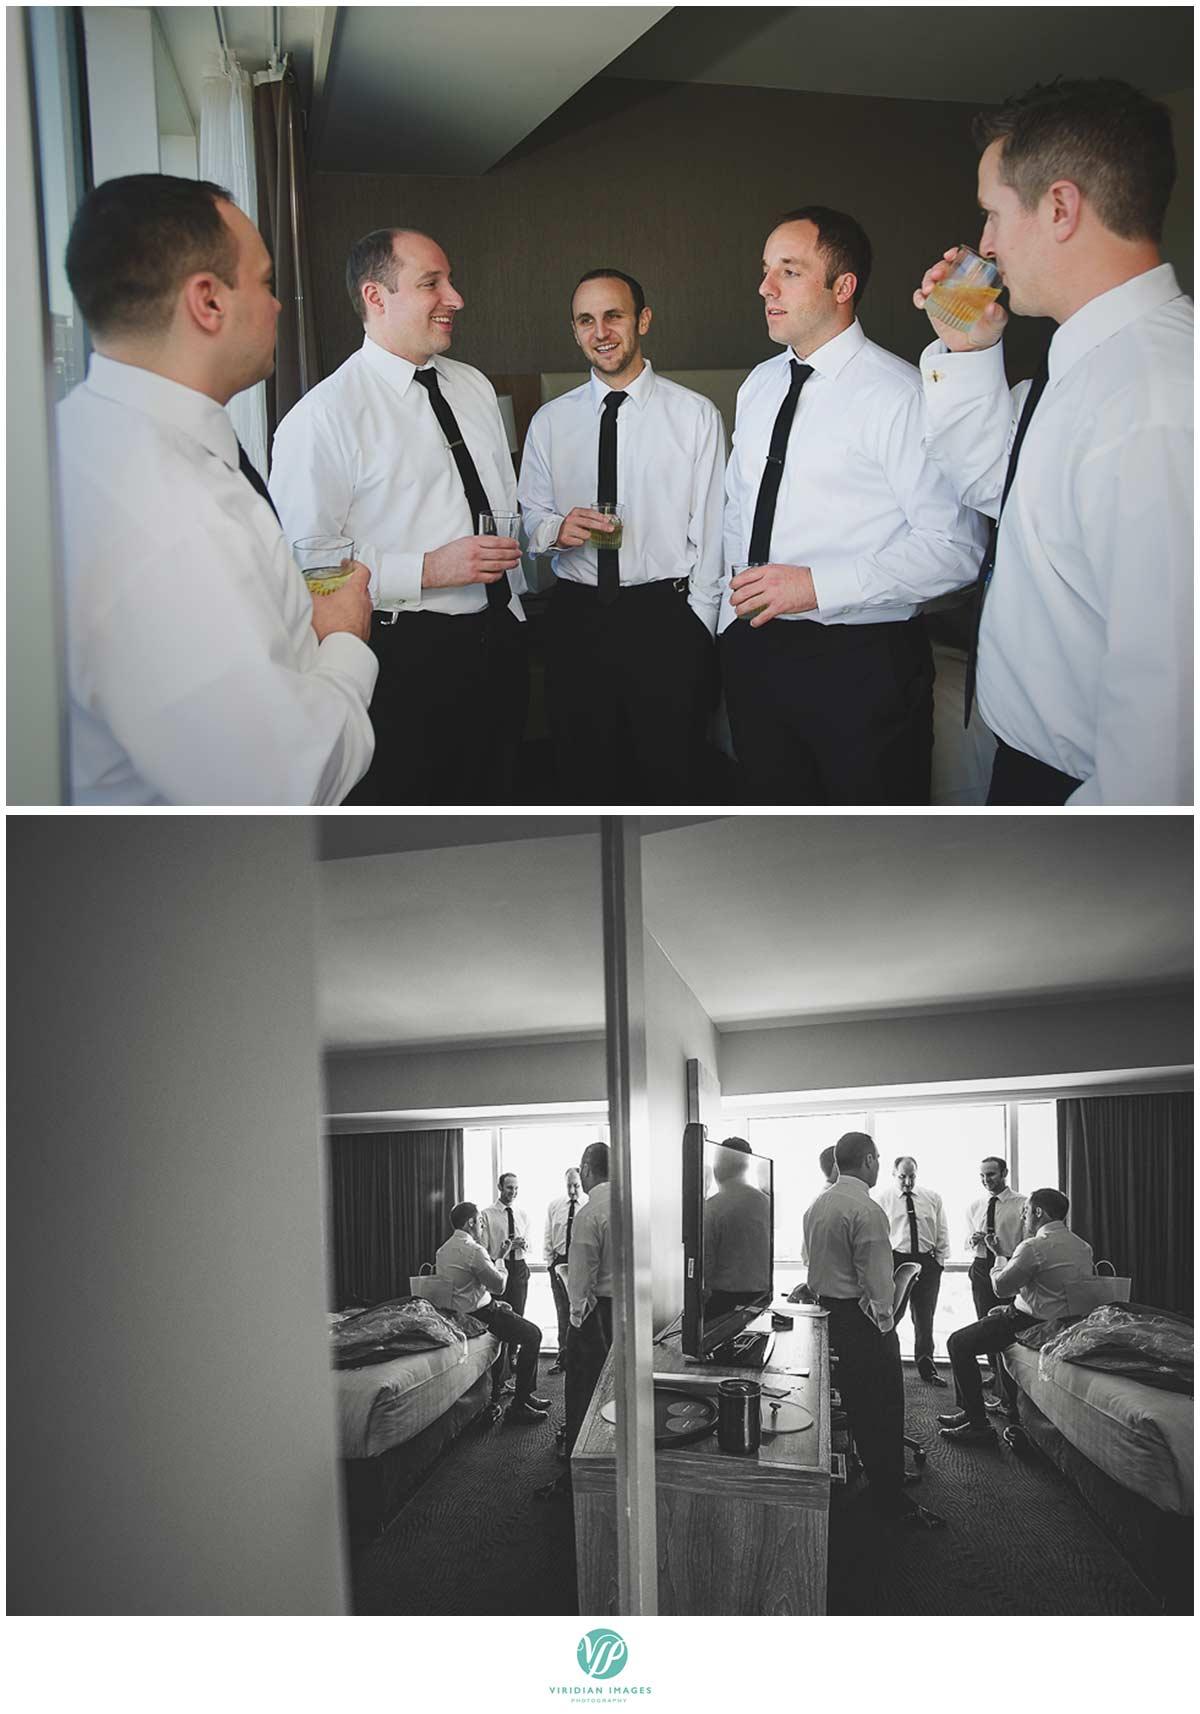 Peachtree_Club_Atlanta_Wedding_Viridian_Images_Photography-12